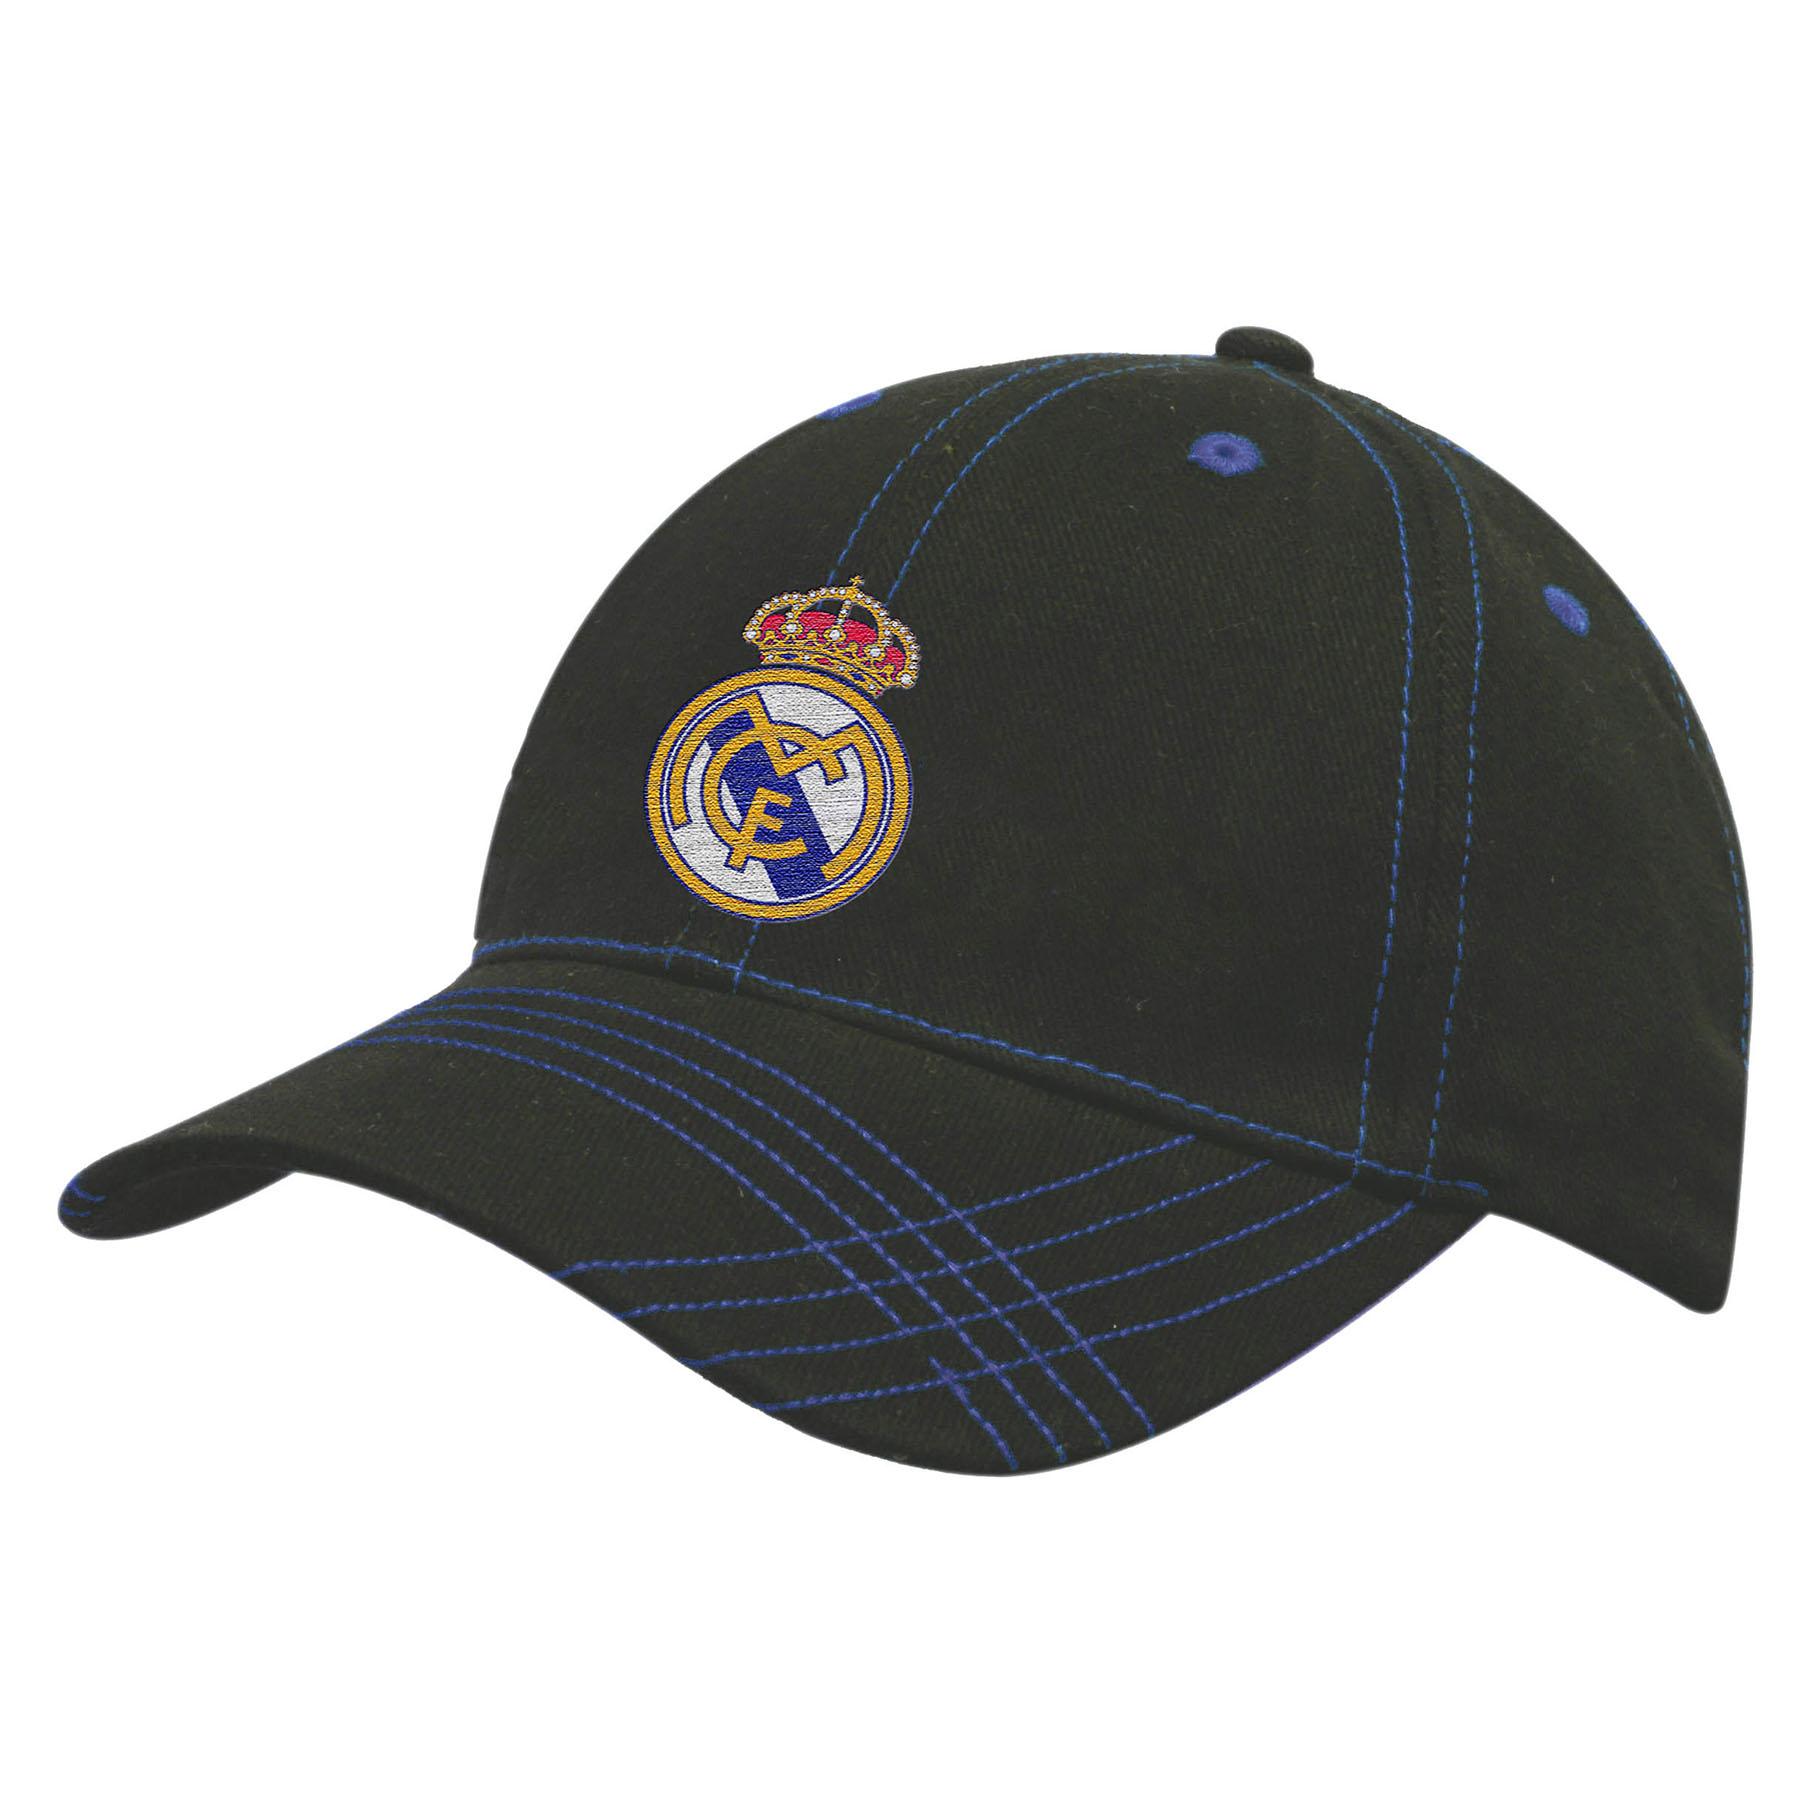 Real Madrid UEFA Champions League Cap - Black - Adult